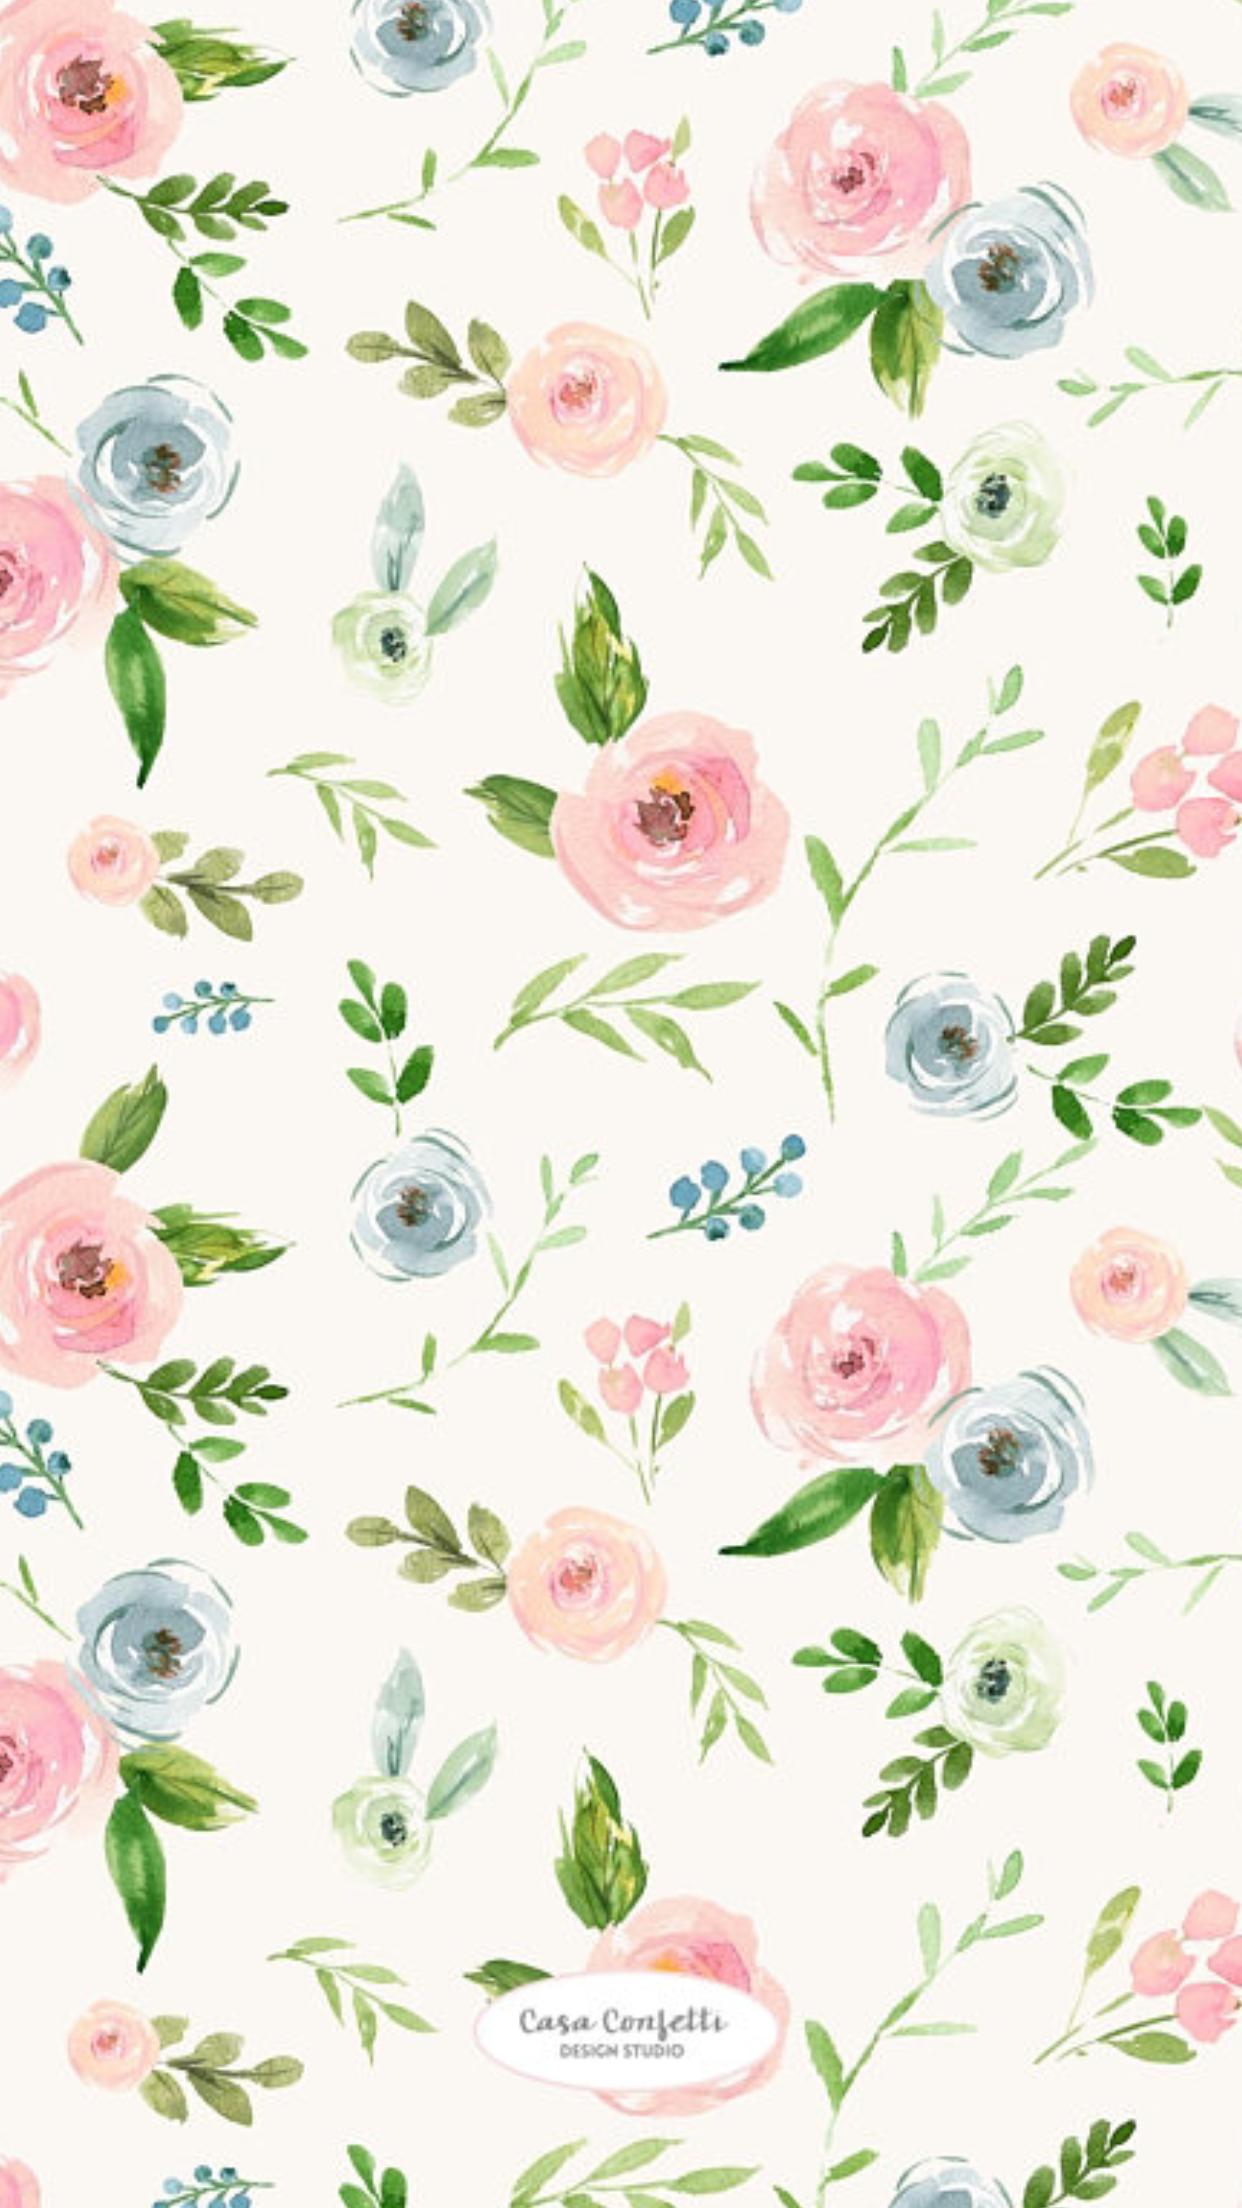 Wallpapers Fondos De Pantalla Sigueme Judith Estefani Flower Wallpaper Floral Wallpaper Flowery Wallpaper